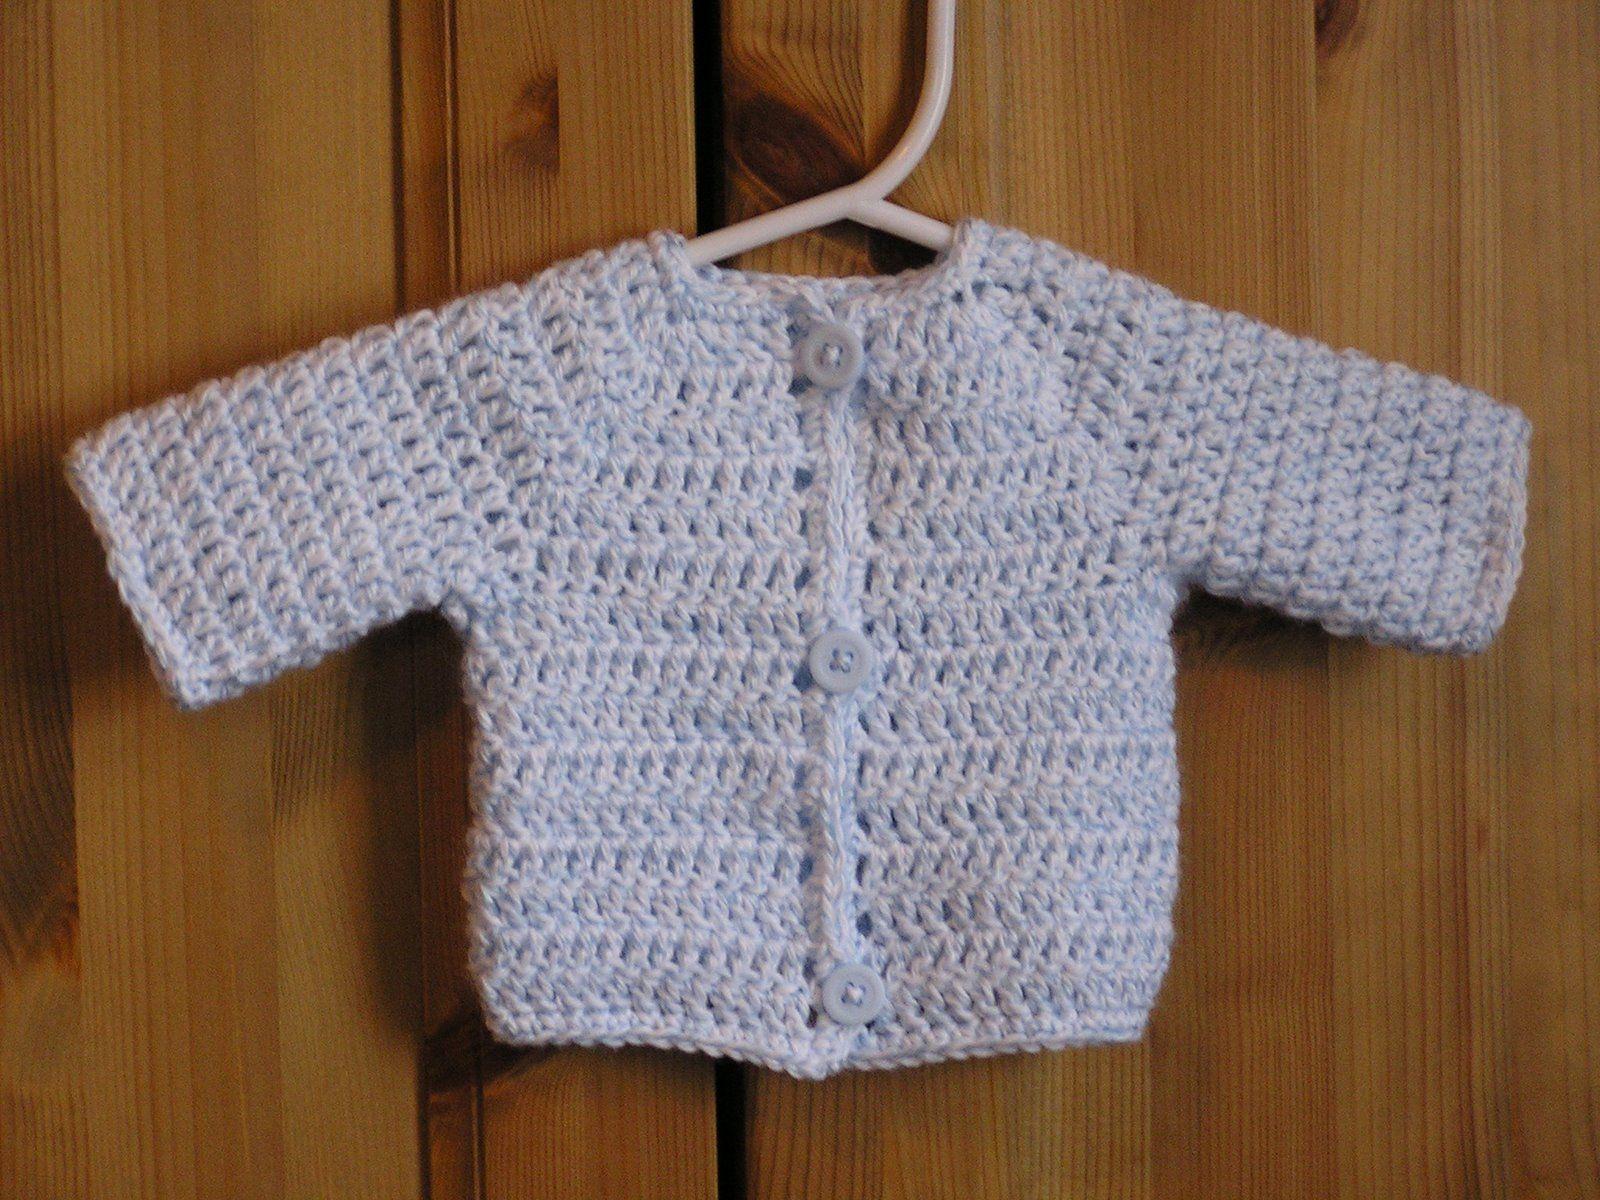 Bella Baby Knitting Patterns : Bella Bambina Knits: Cardigan for Babies BABY SHOWERS Pinterest Babies,...